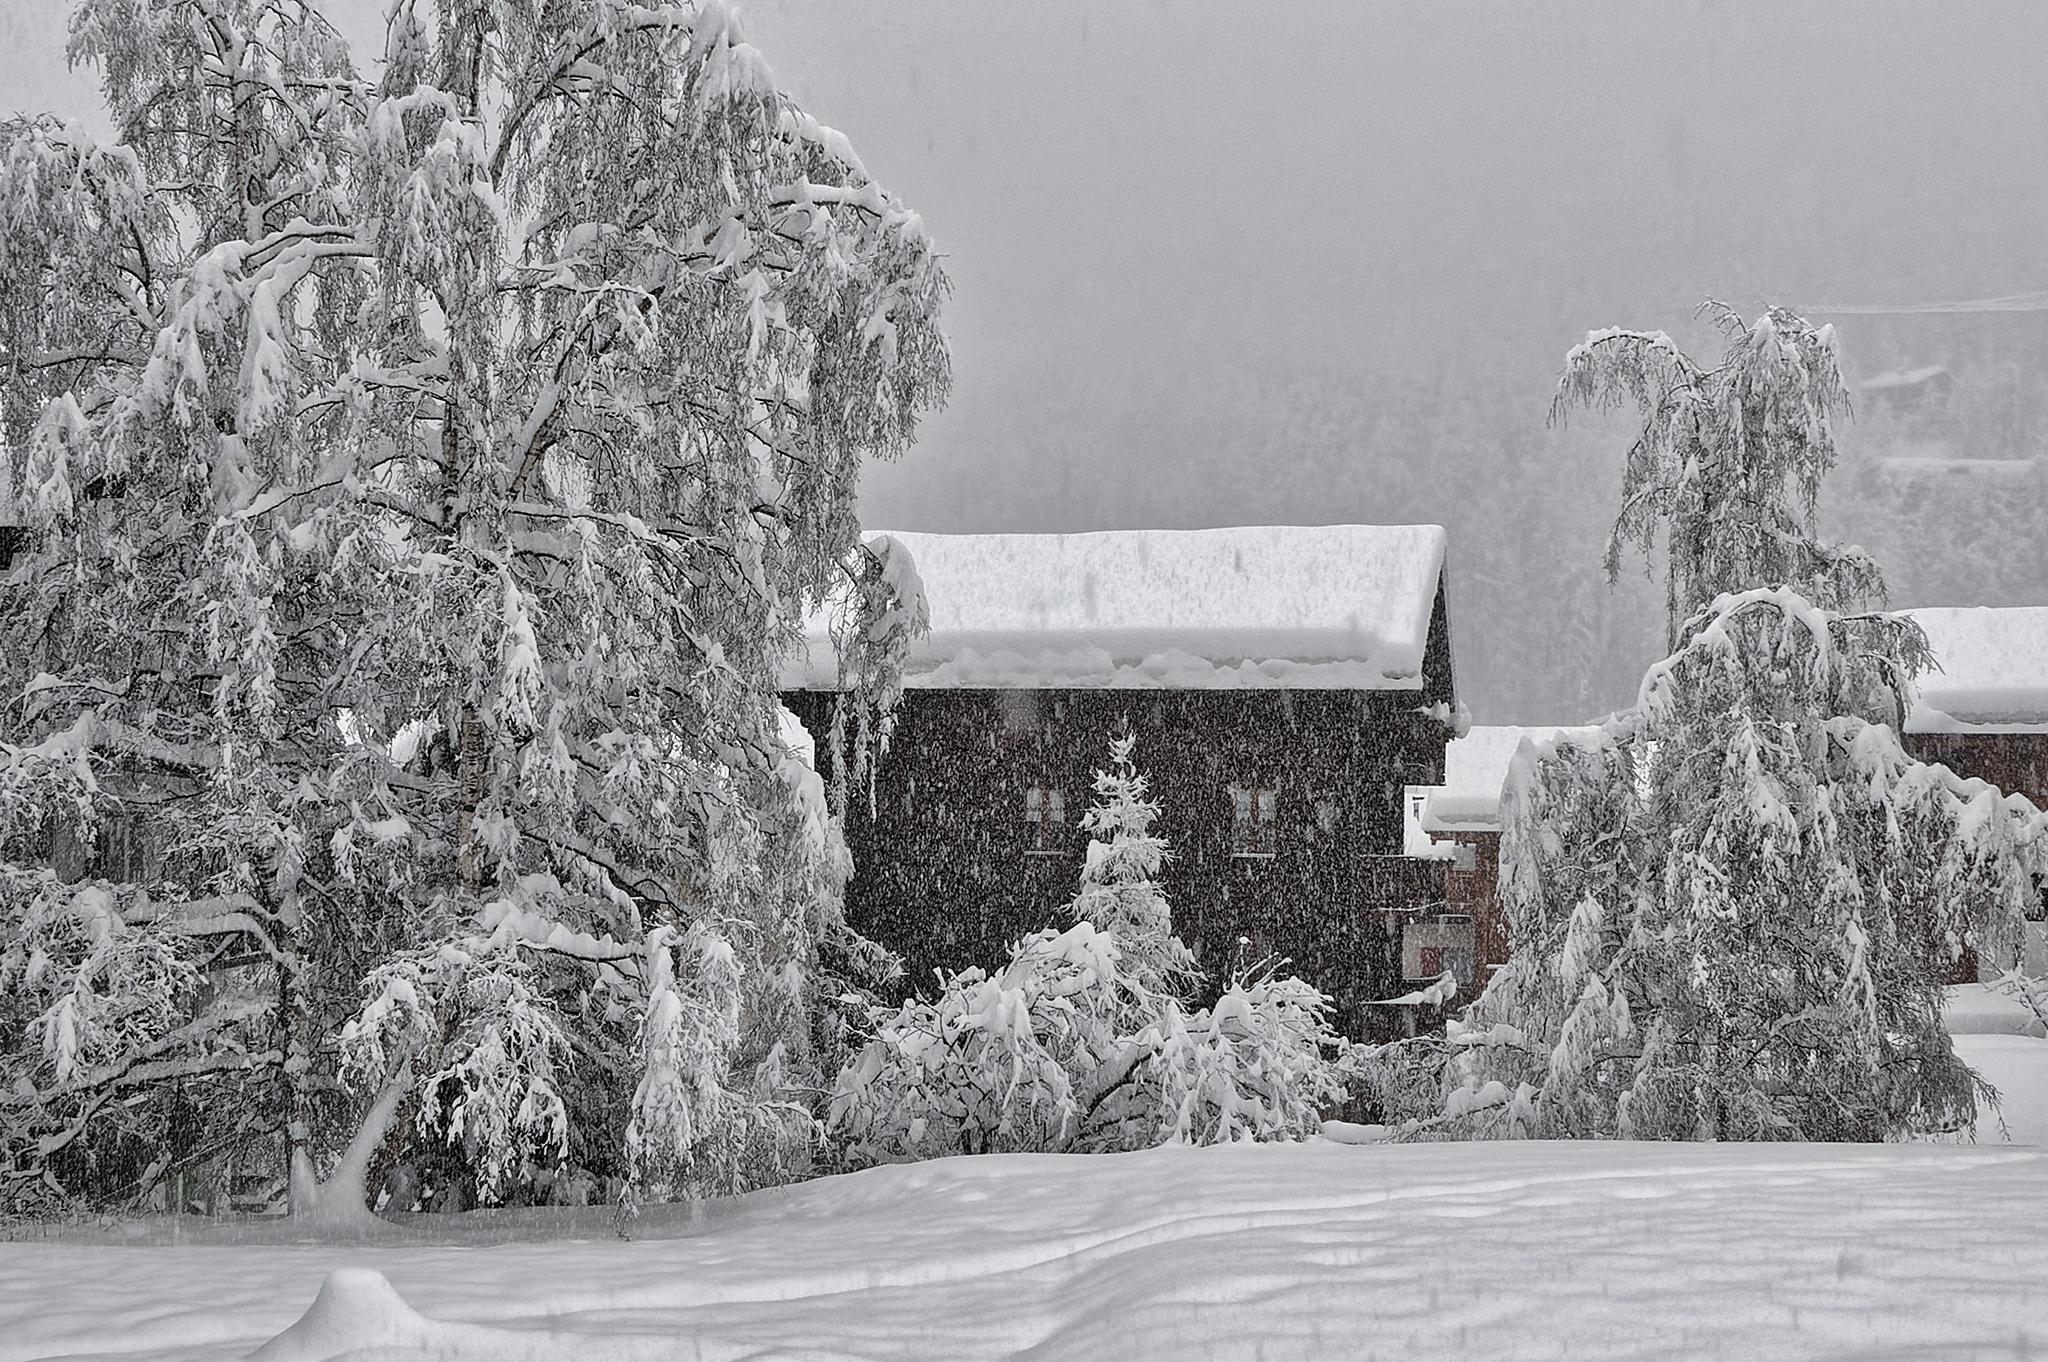 Real Winter by Herbert Stachelberger